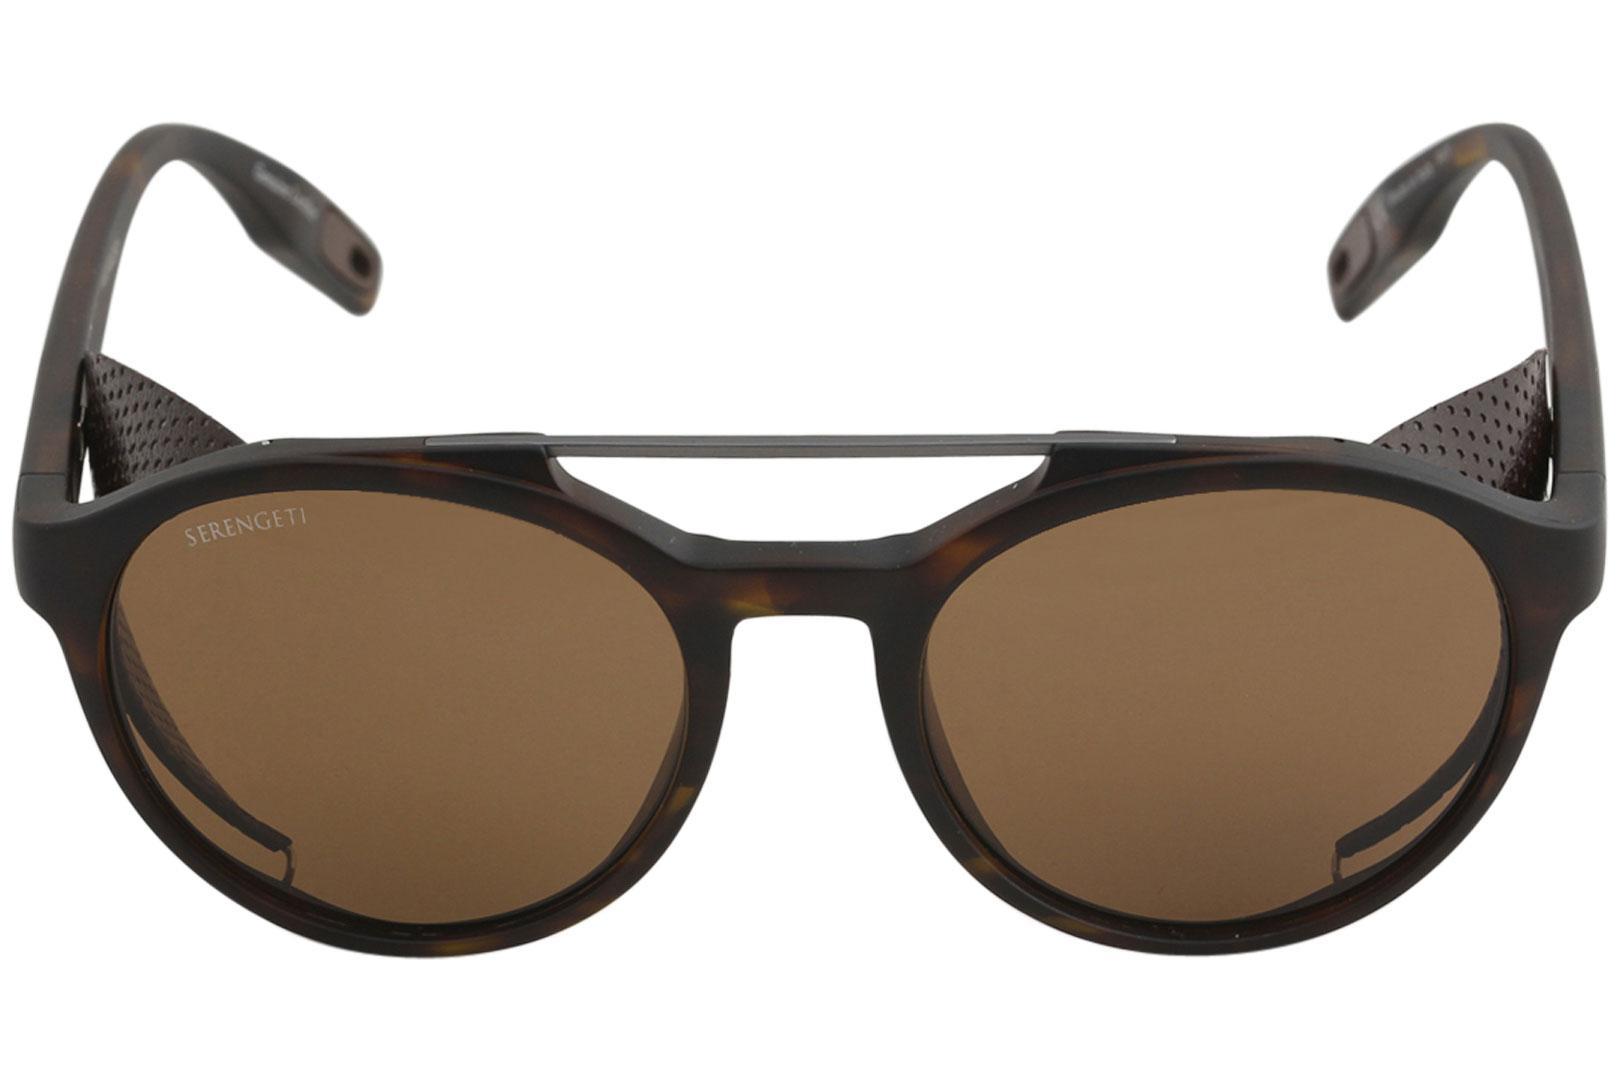 32949c058342 Serengeti Men's Leandro Glacier Fashion Pilot Polarized Sunglasses by  Serengeti. 12345